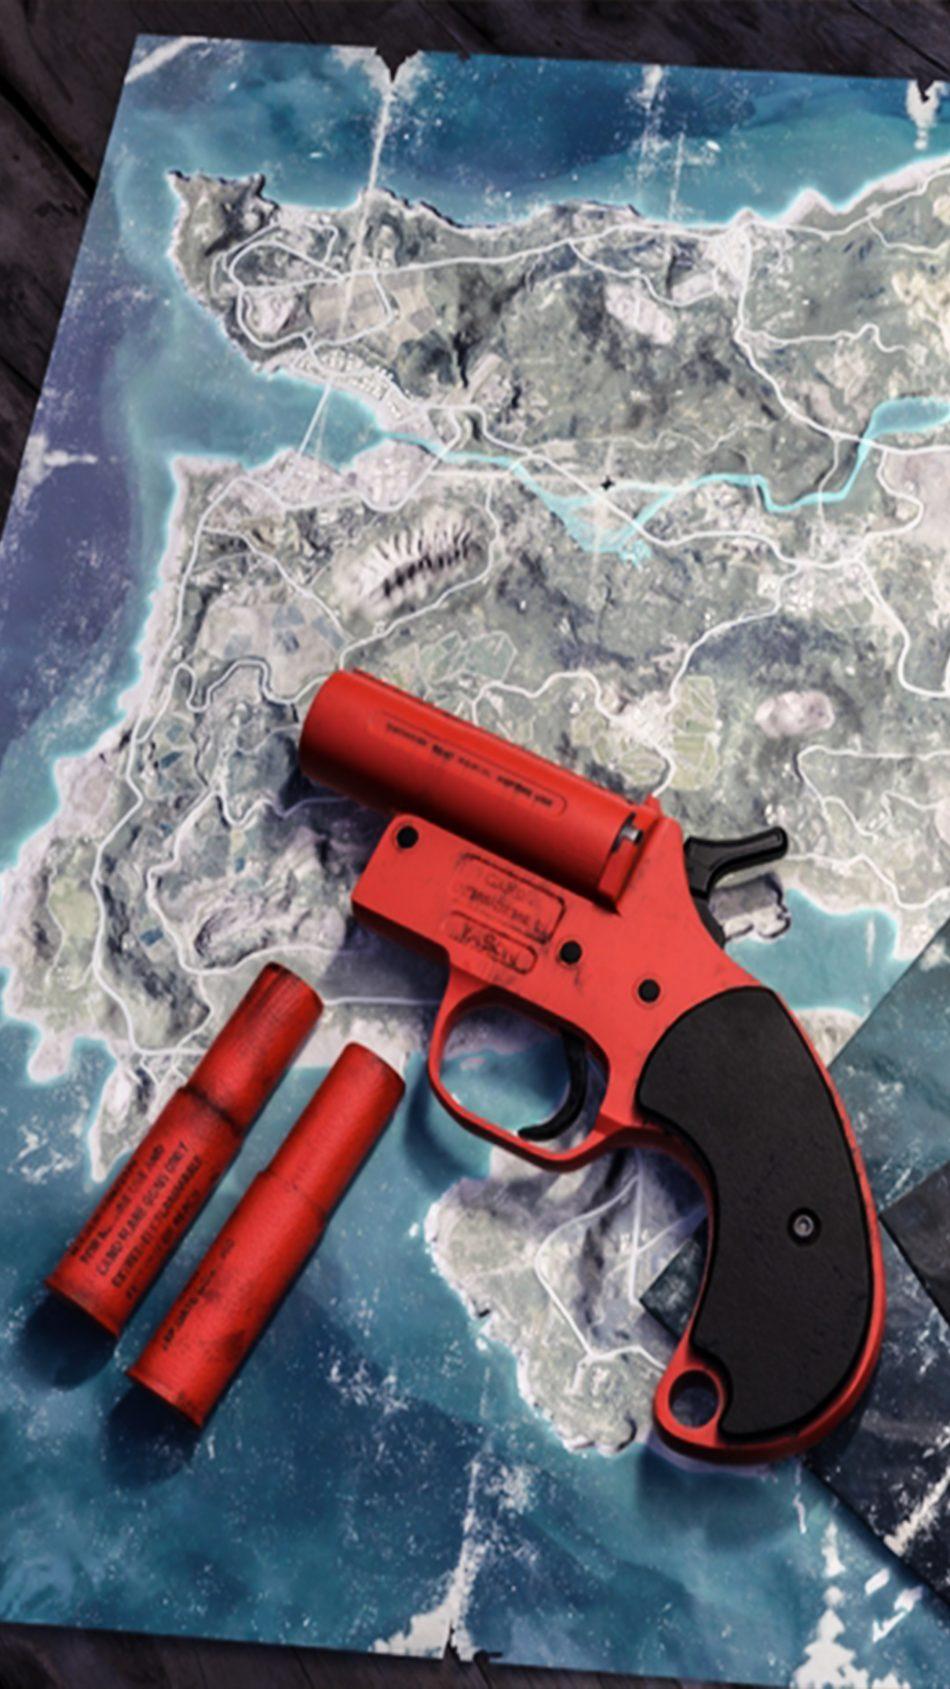 Download Pubg Flare Gun Free Pure 4k Ultra Hd Mobile Wallpaper